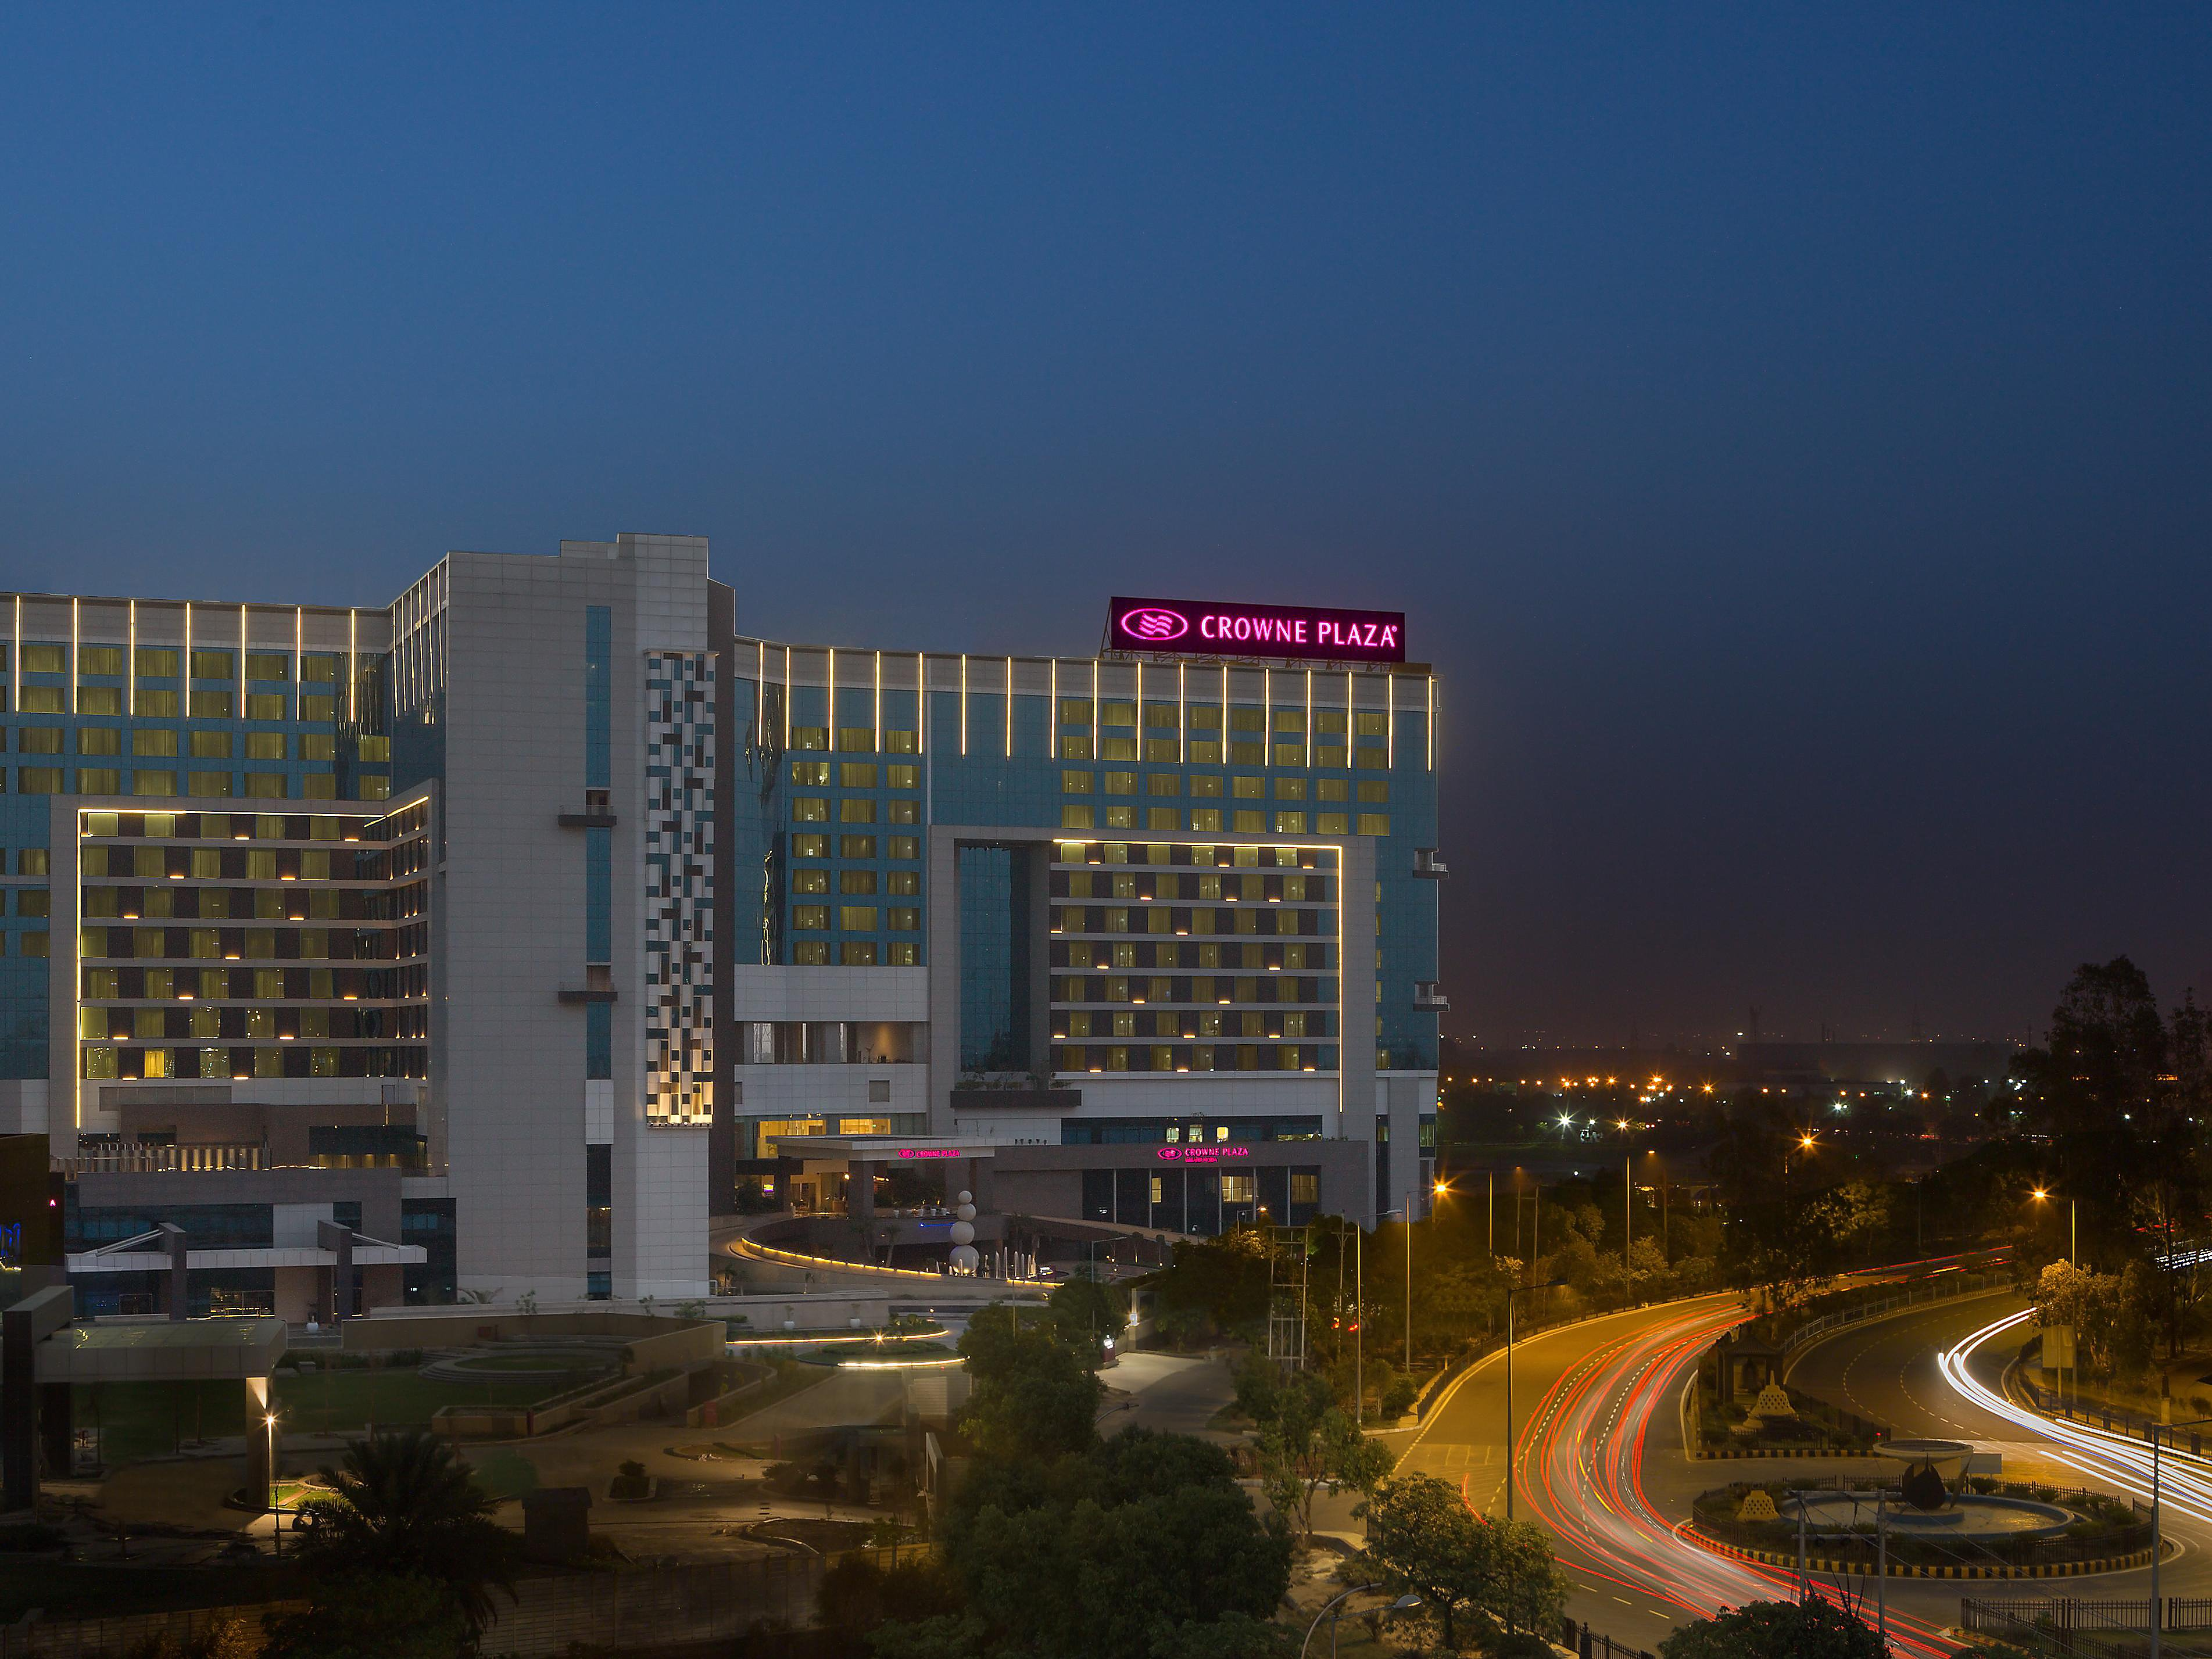 Crowne Plaza Greater Noida Delhi Ncr India